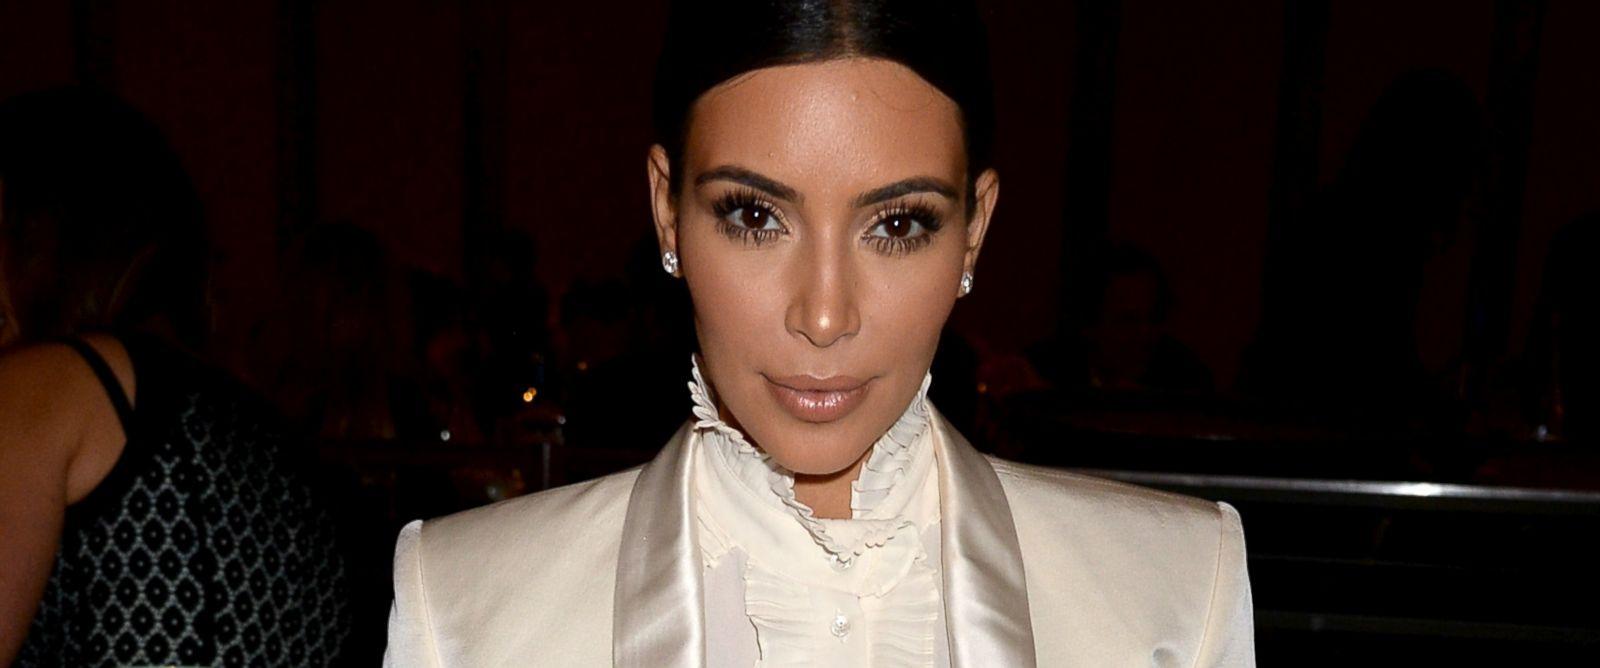 PHOTO: TV personality Kim Kardashian attends USC Shoah Foundations 20th Anniversary Gala at the Hyatt Regency Century Plaza, May 7, 2014, in Century City, Calif.